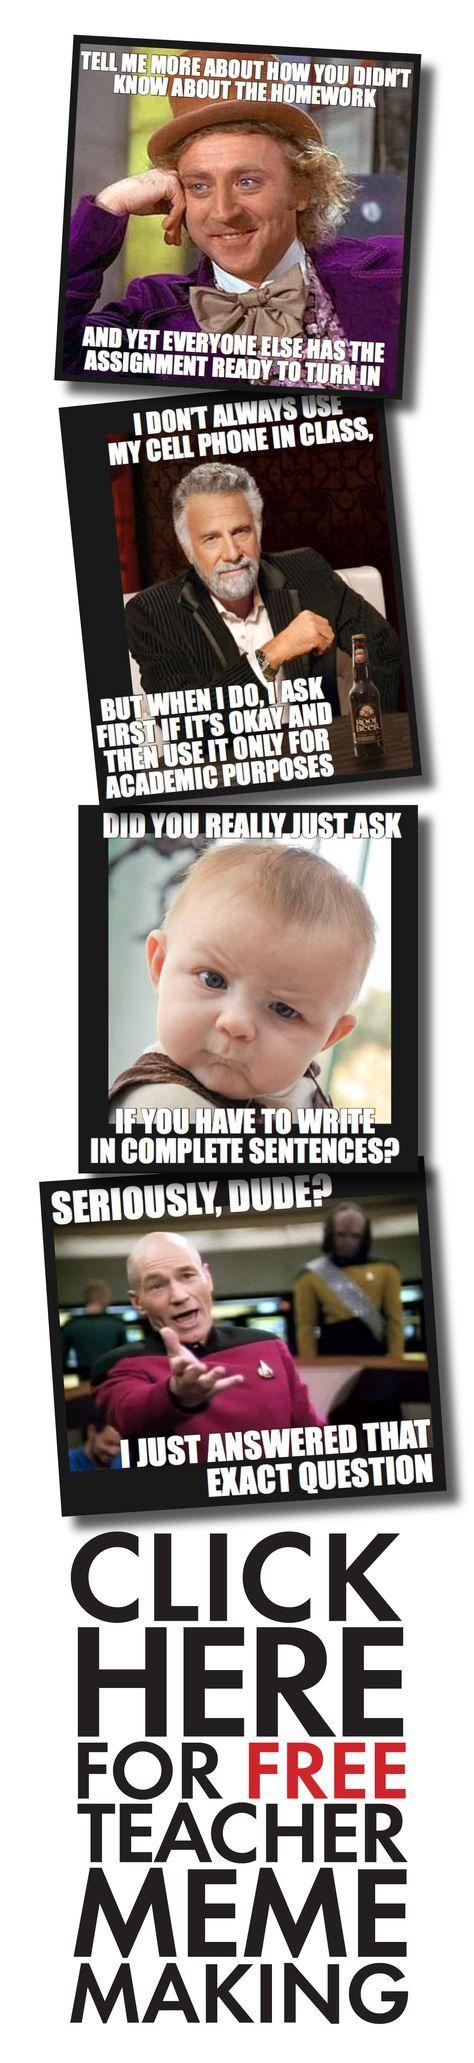 Meme Me Up Scotty Classroom Memes Teacher Memes Funny